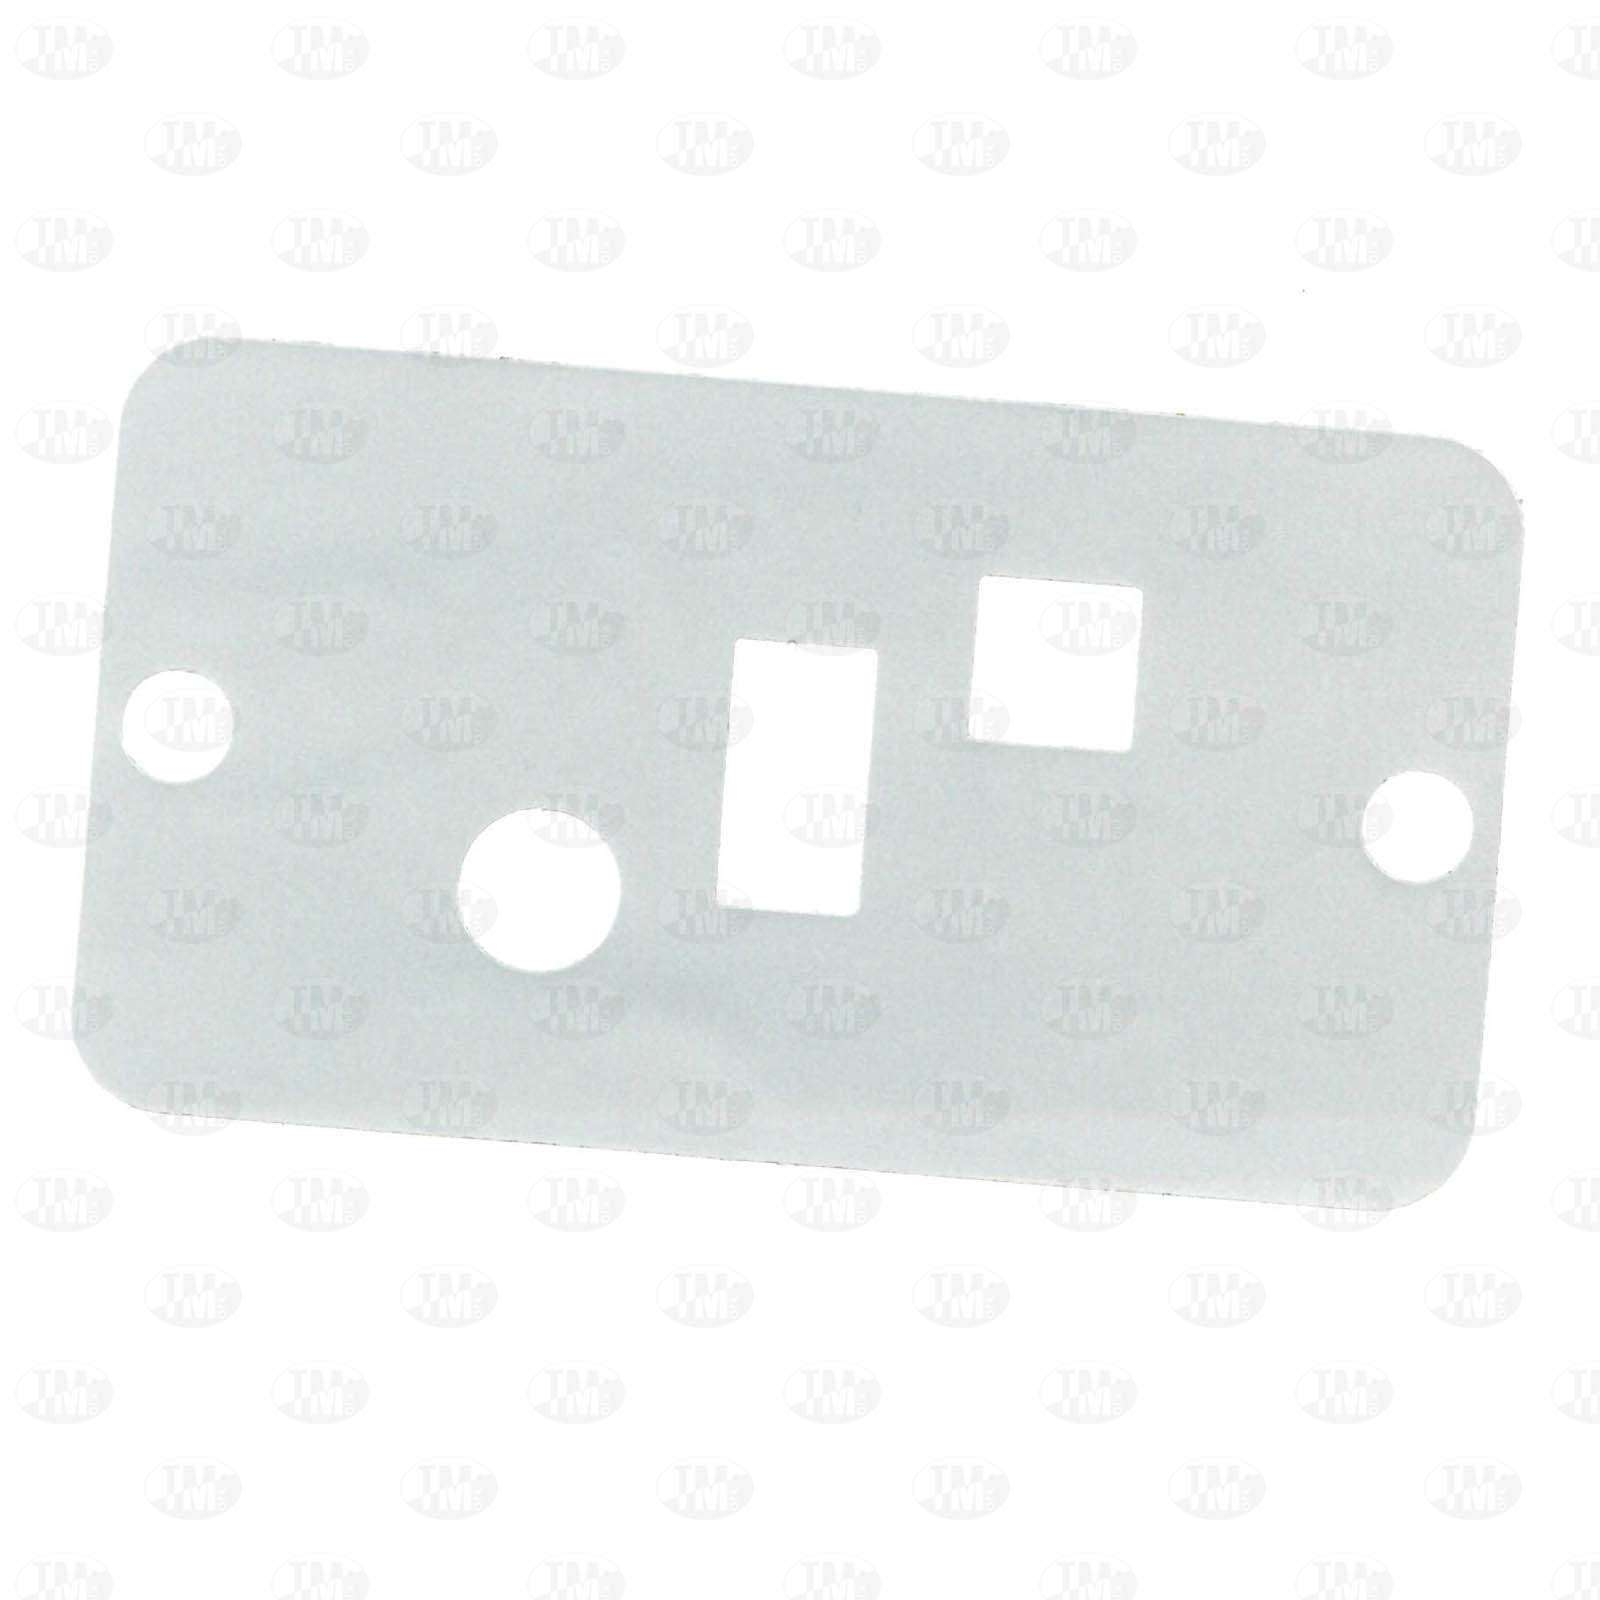 Этикетки 68*38 для панели без печати